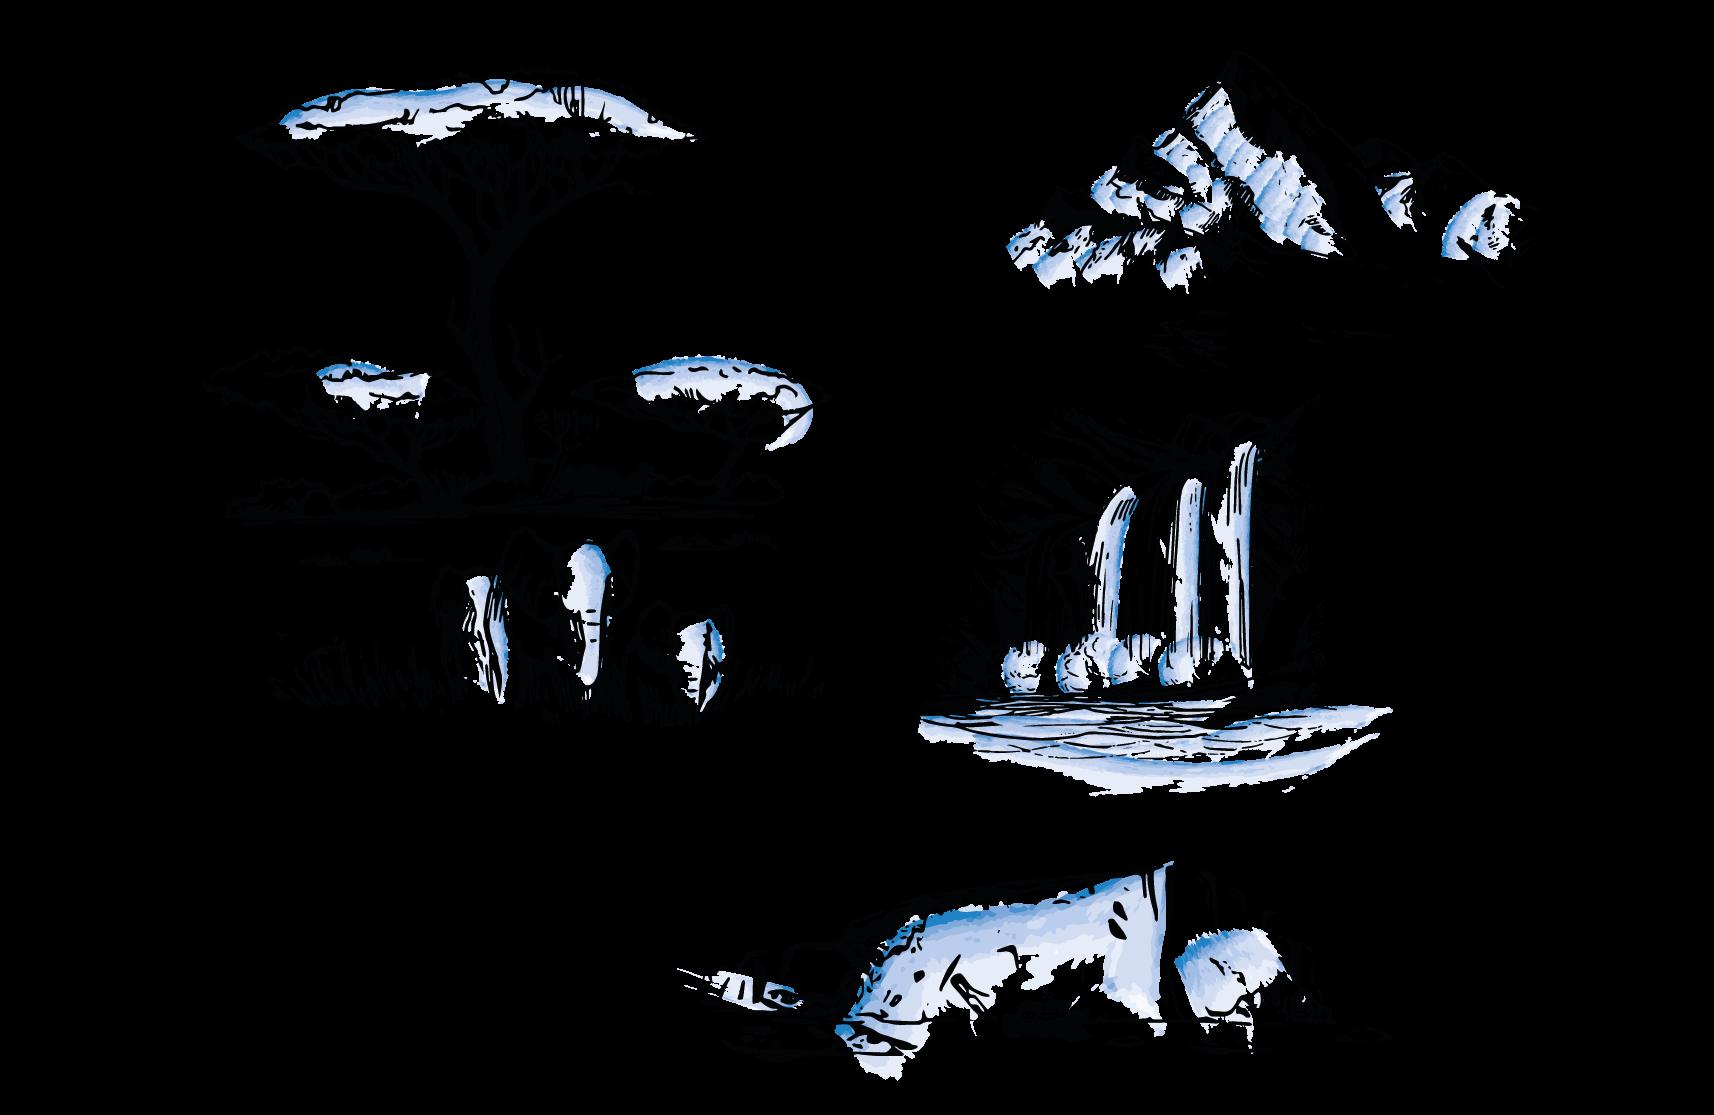 Paisajes únicos   Viajes Planeta Azul